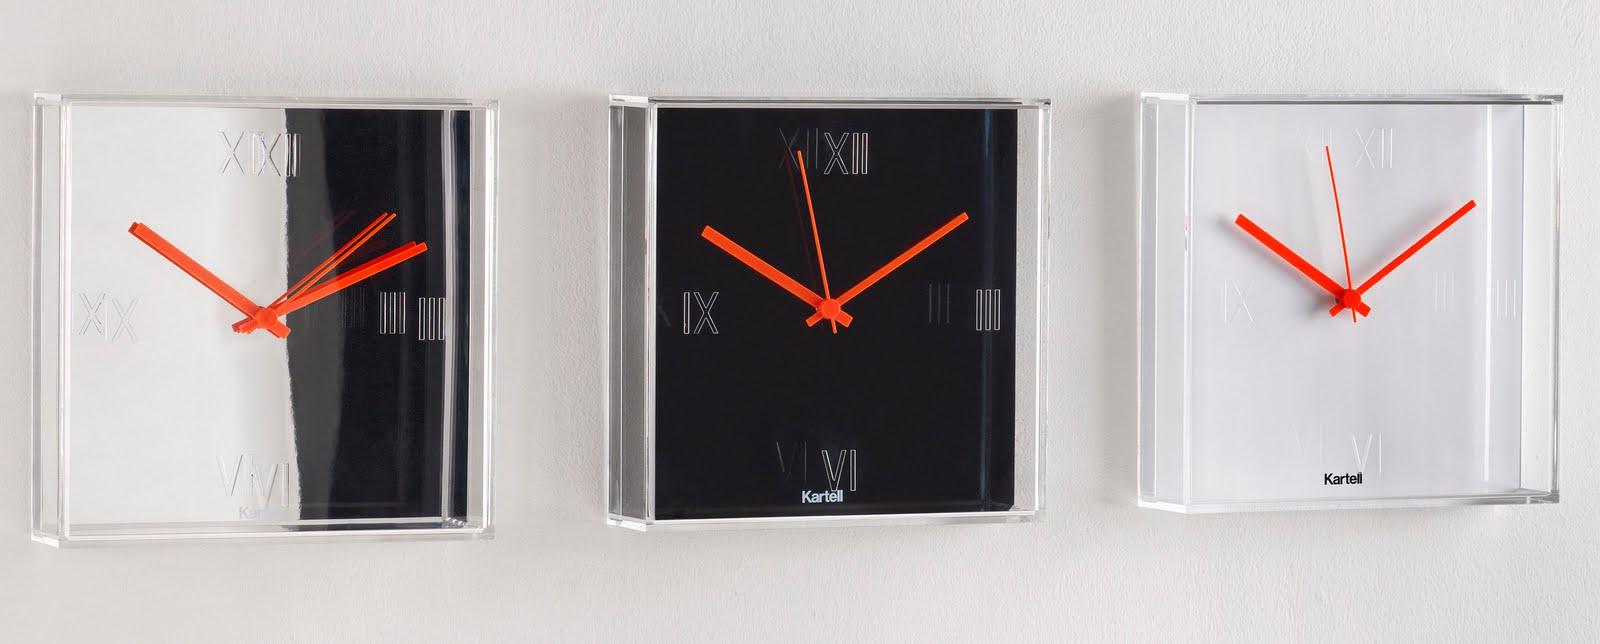 modern interior design tic  tac square modern wall clock by  - tic  tac square modern wall clock by philippe starck for kartell  tic tacclock (chrome)